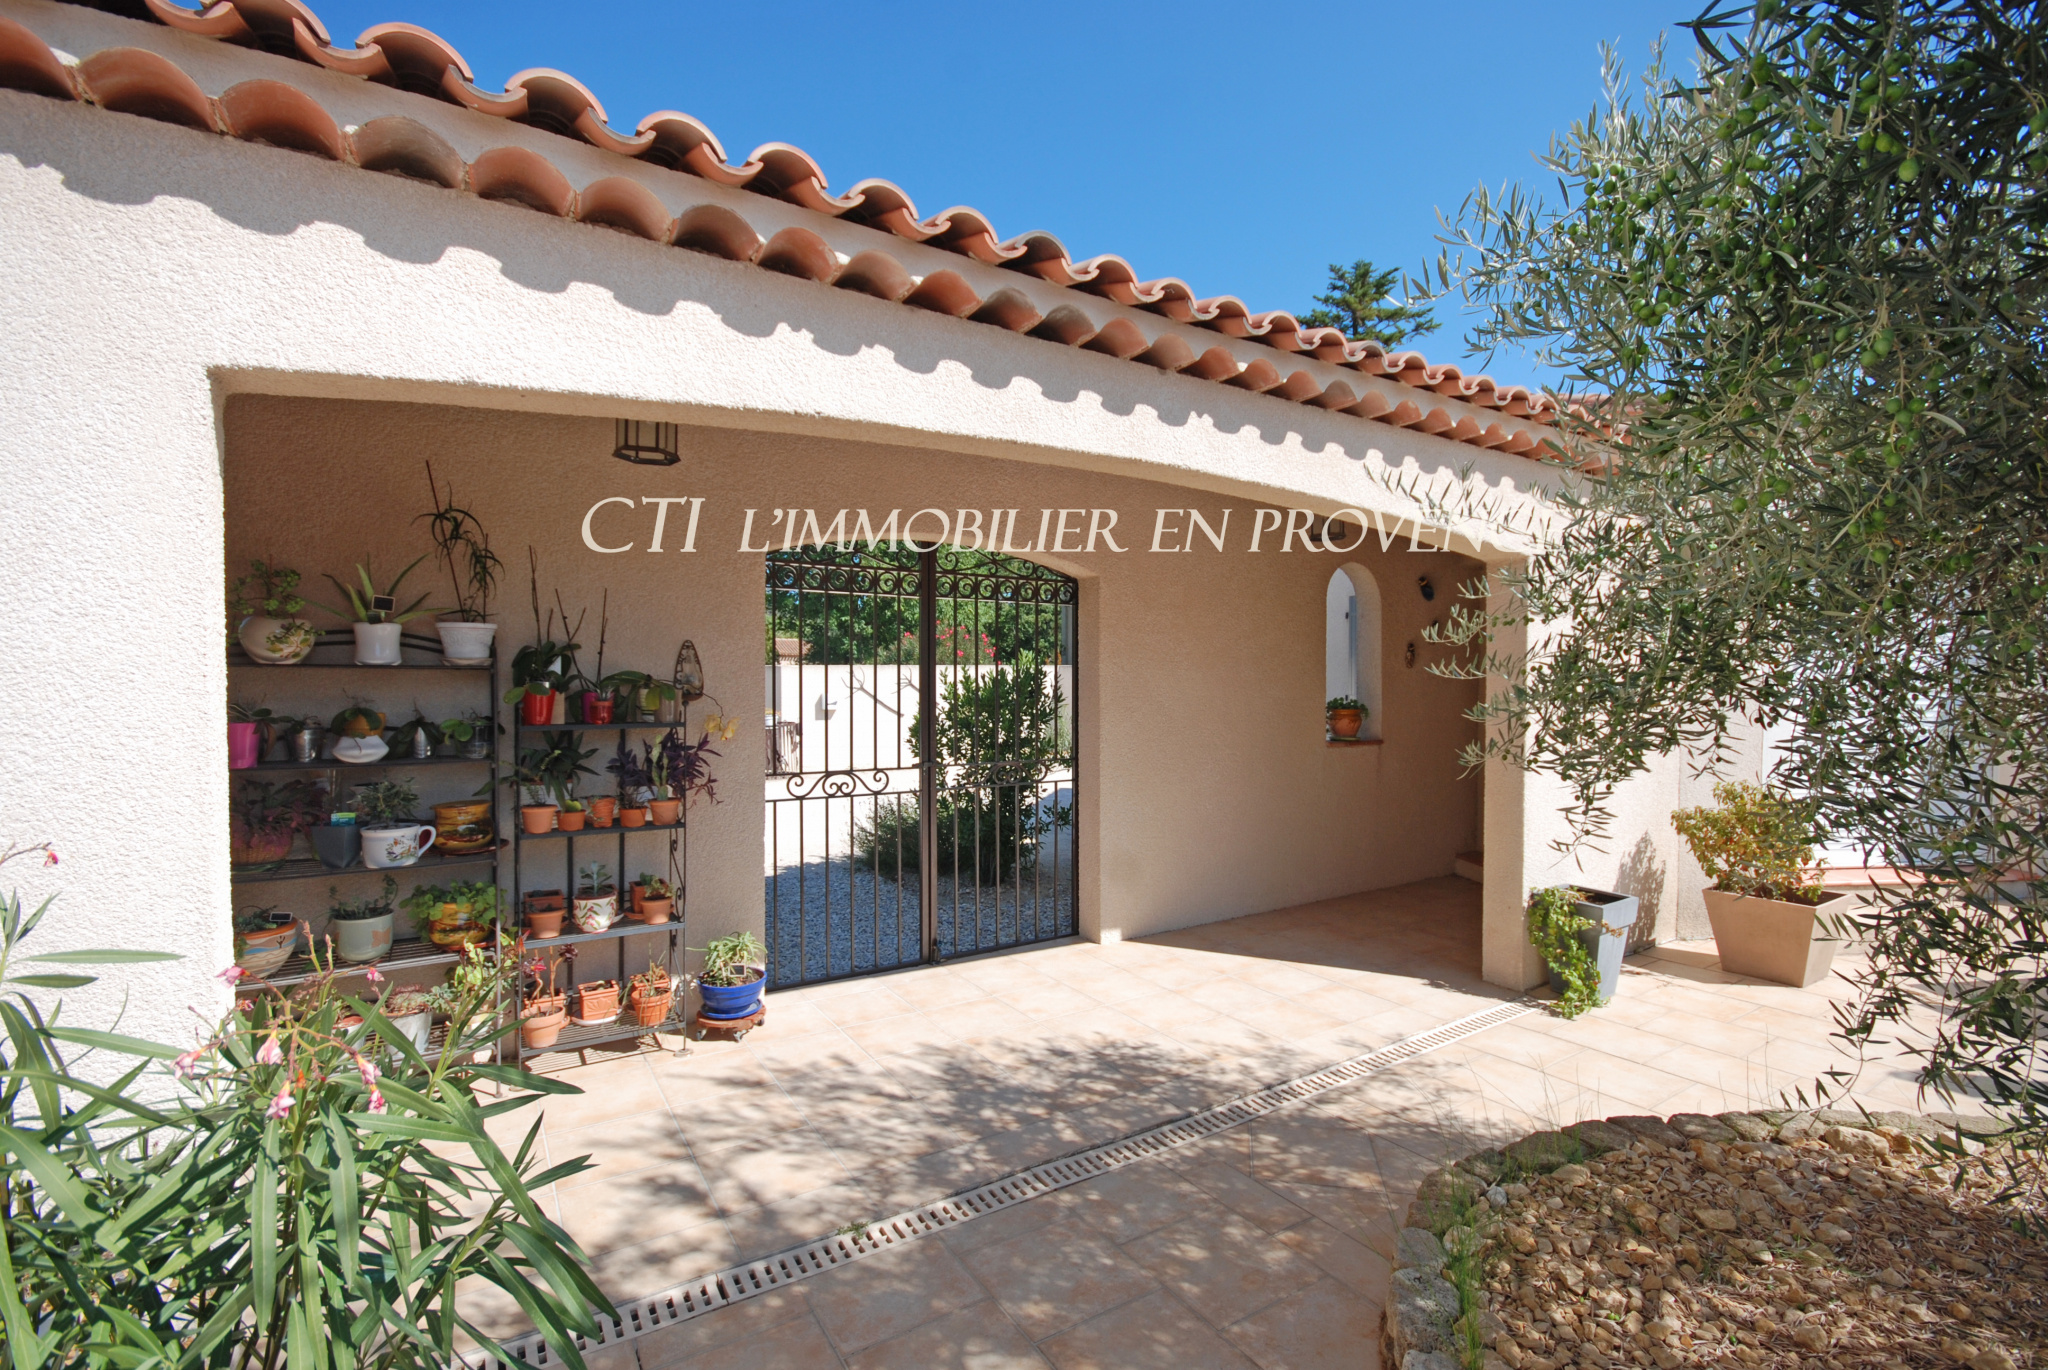 0 www.cti-provence.net A VENDRE PROPRIETE 3 HABITATIONS -  GITES CHAMBRES D'HOTES JARDIN PISCINE